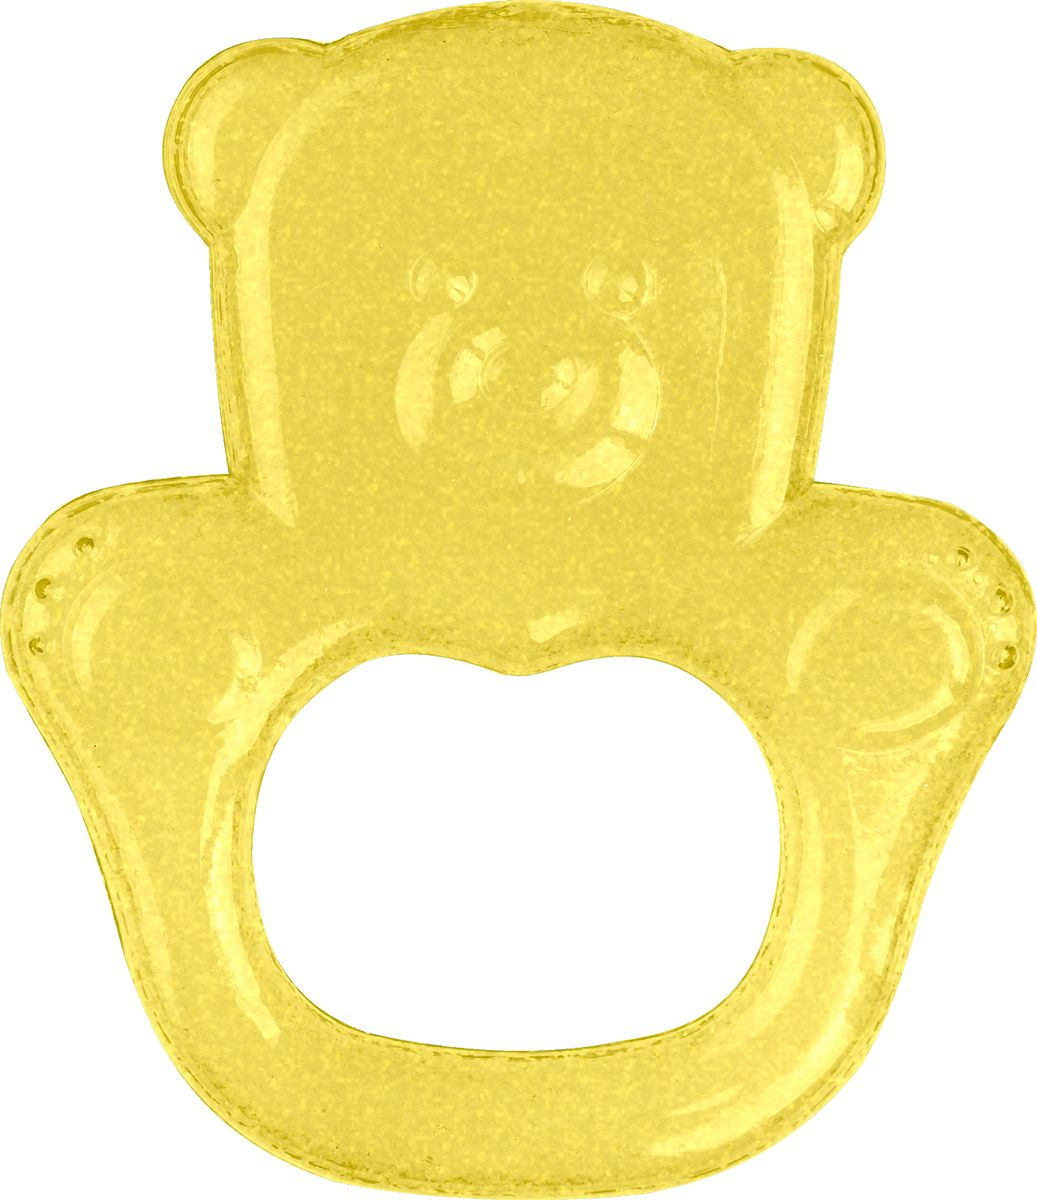 BabyOno Прорезыватель охлаждающий Мишка цвет желтый